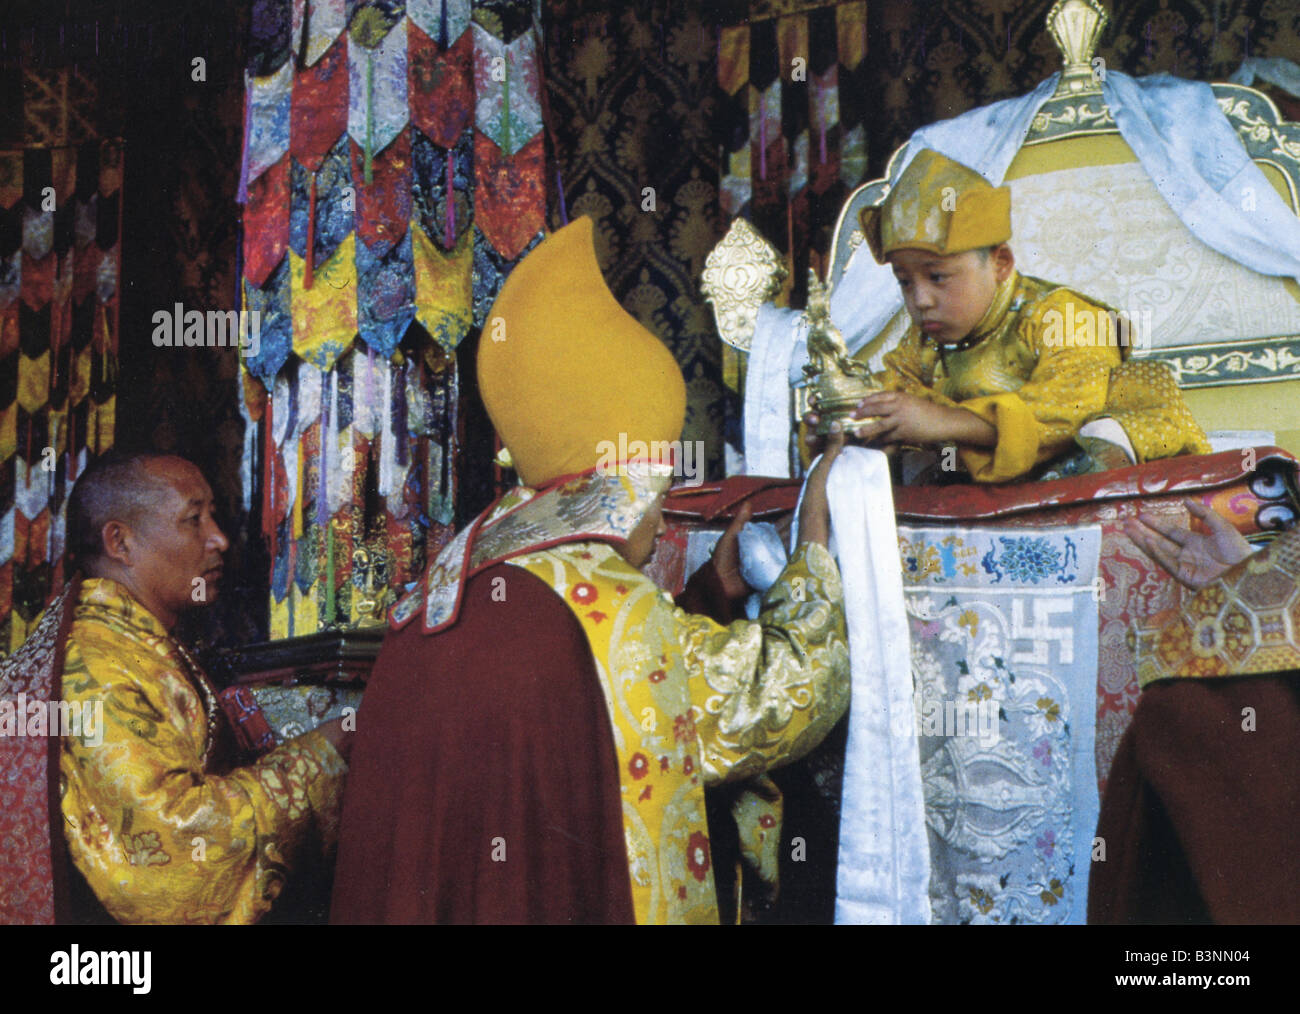 KUNDUN  1997 Buena Vista/Touchstone film biopic of the Dalai Lama - Stock Image